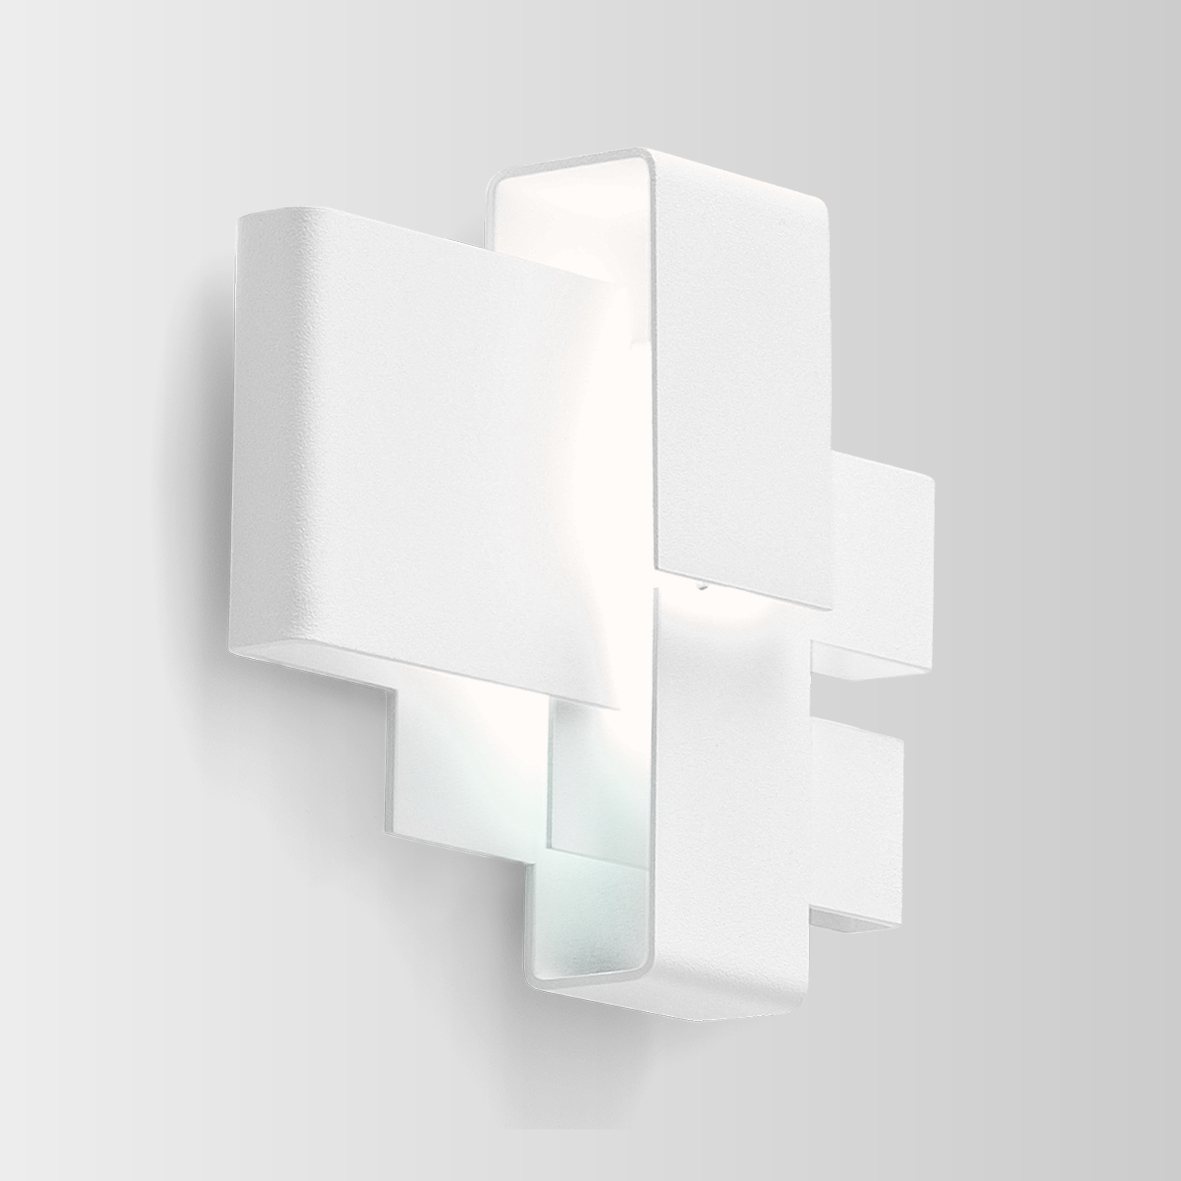 ARZY 1.0 LED 3000K 6W 80CRI 110-240VAC, valge seinavalgusti